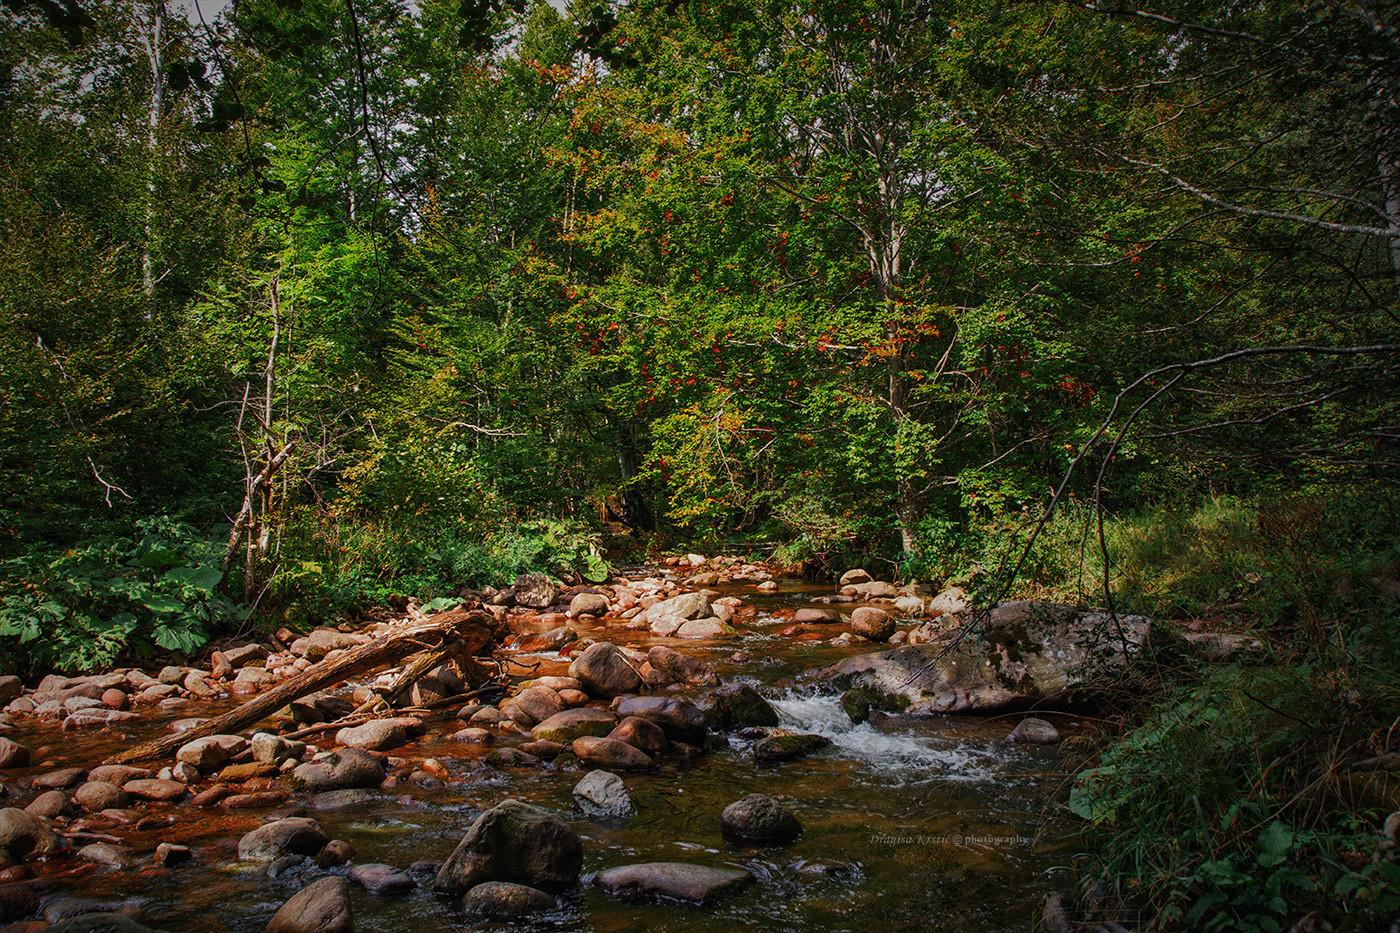 Drvlje & kamenje